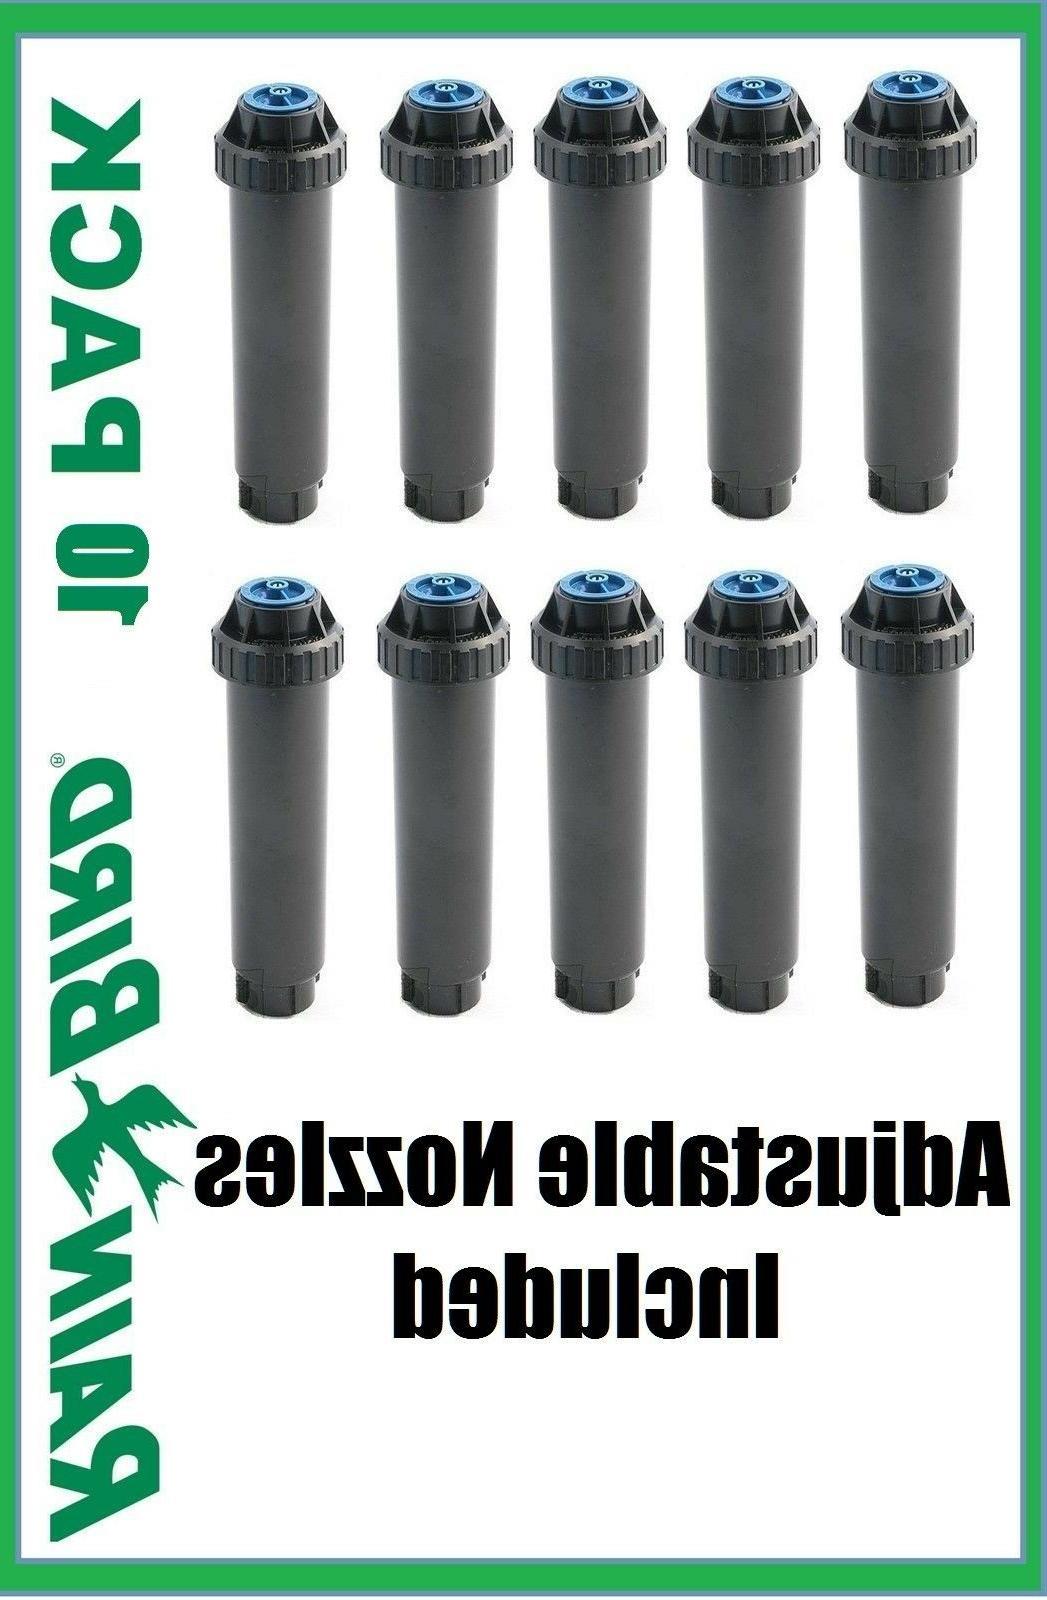 10 4 uni spray head sprinkler w